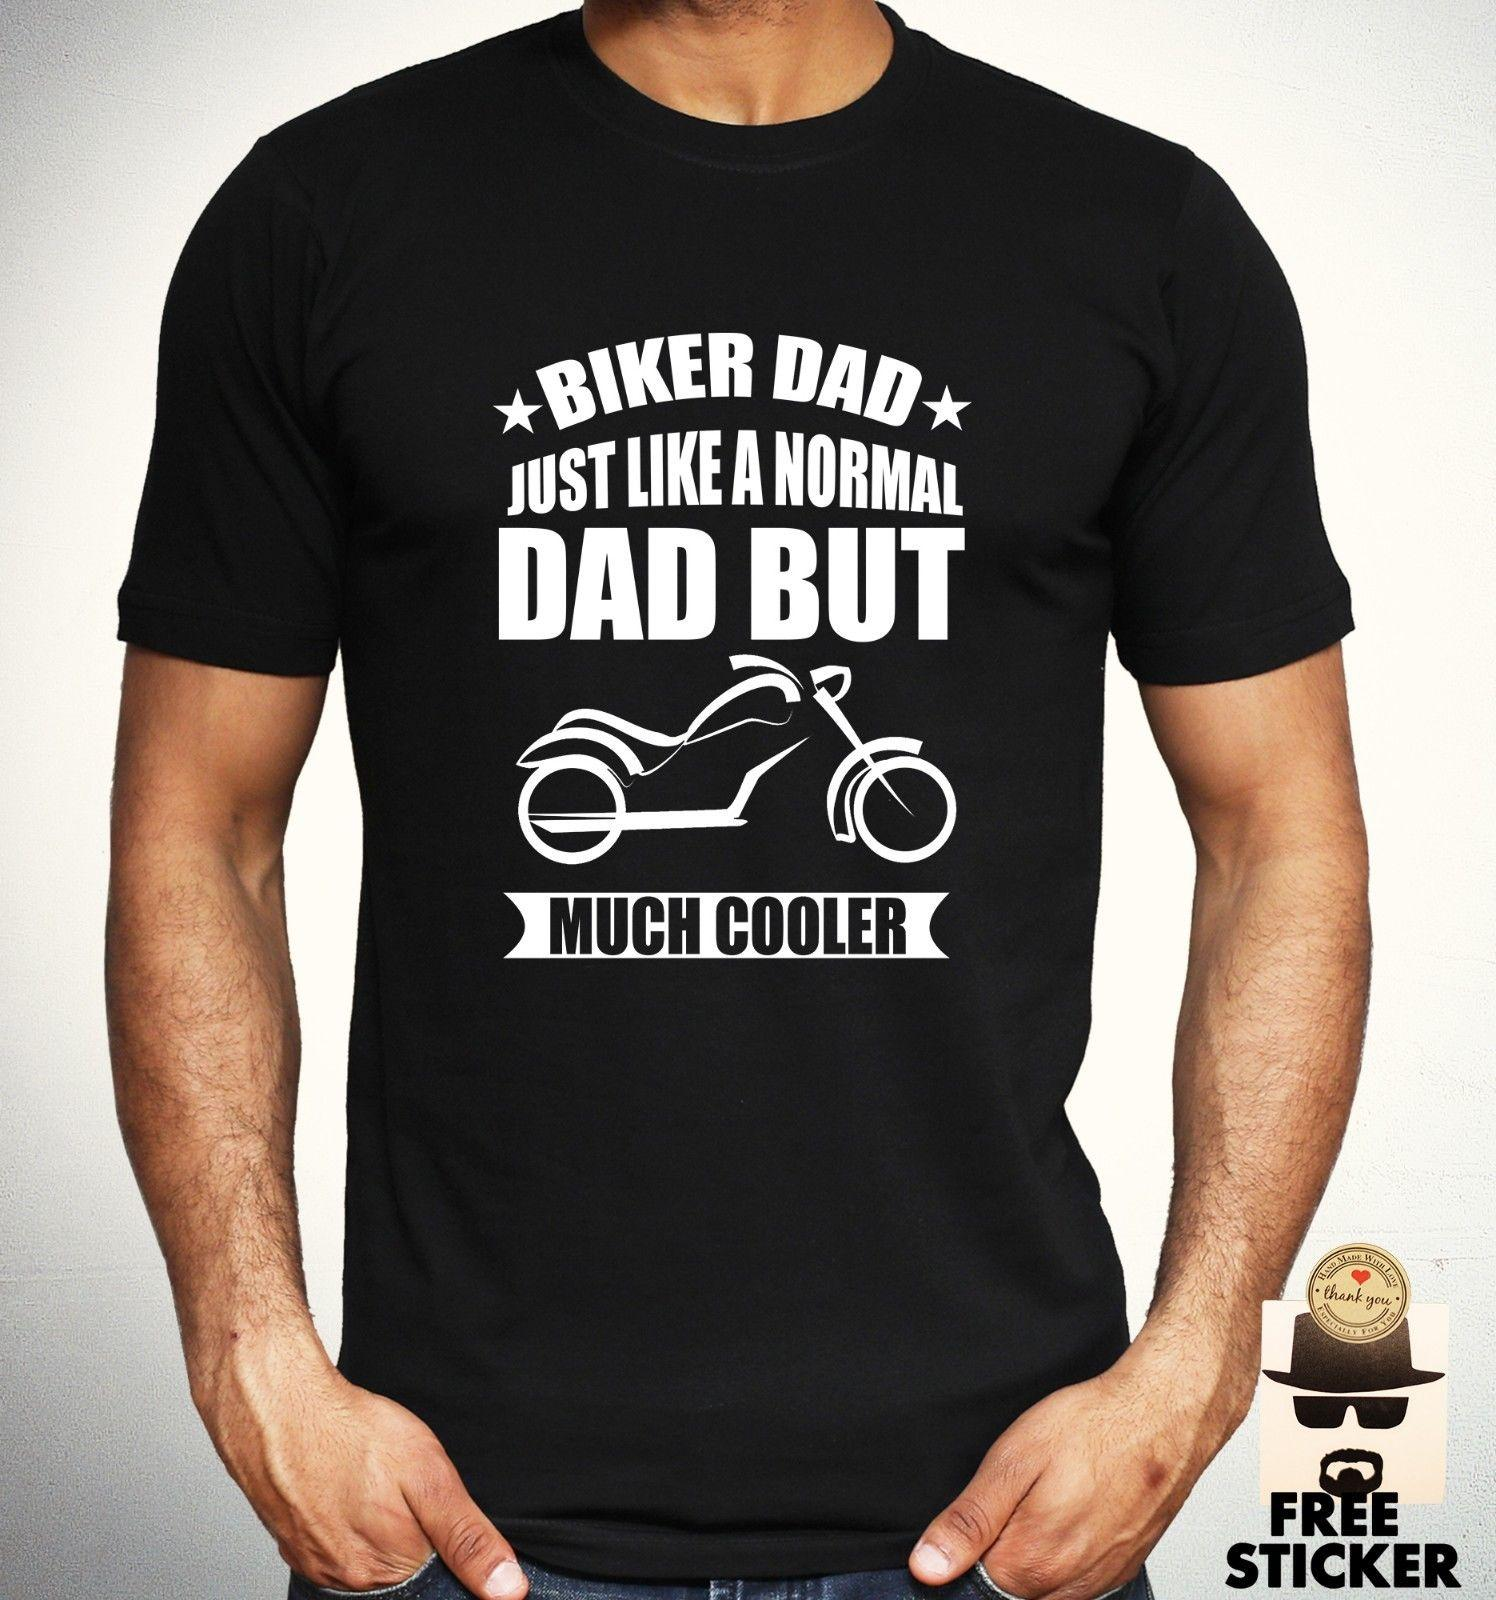 Biker Dad T Shirt Motorcycle Cool Father Birthday Present Gift Top Mens Buy Fun From Printforless51 1158